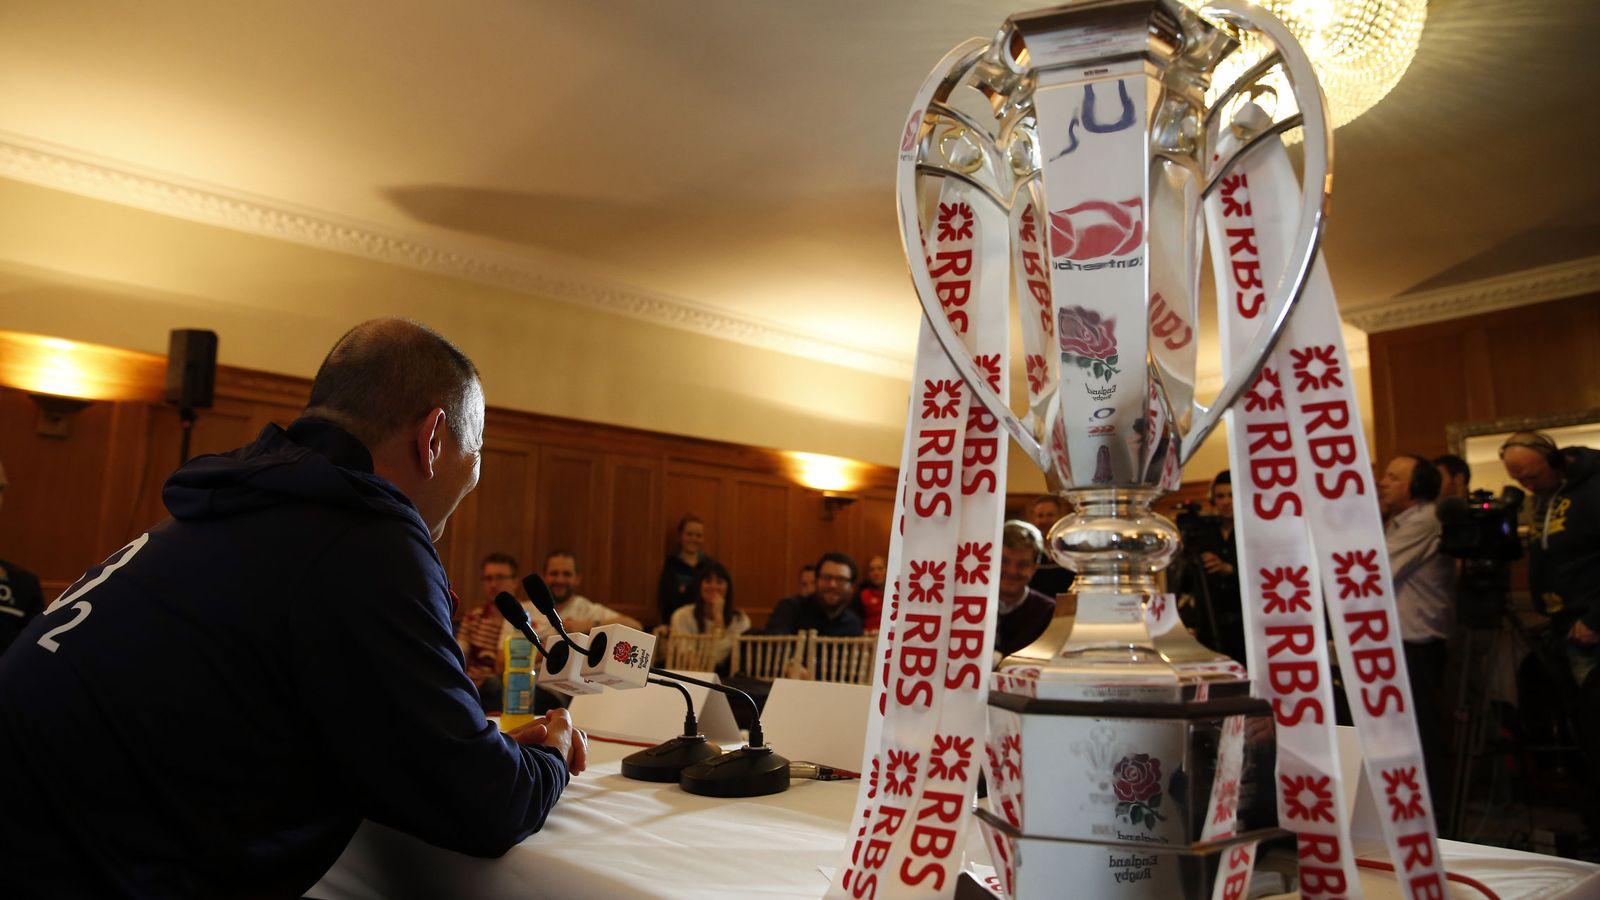 Foto: Inglaterra ganó la última edición del Seis Naciones (Paul Childs/Reuters)